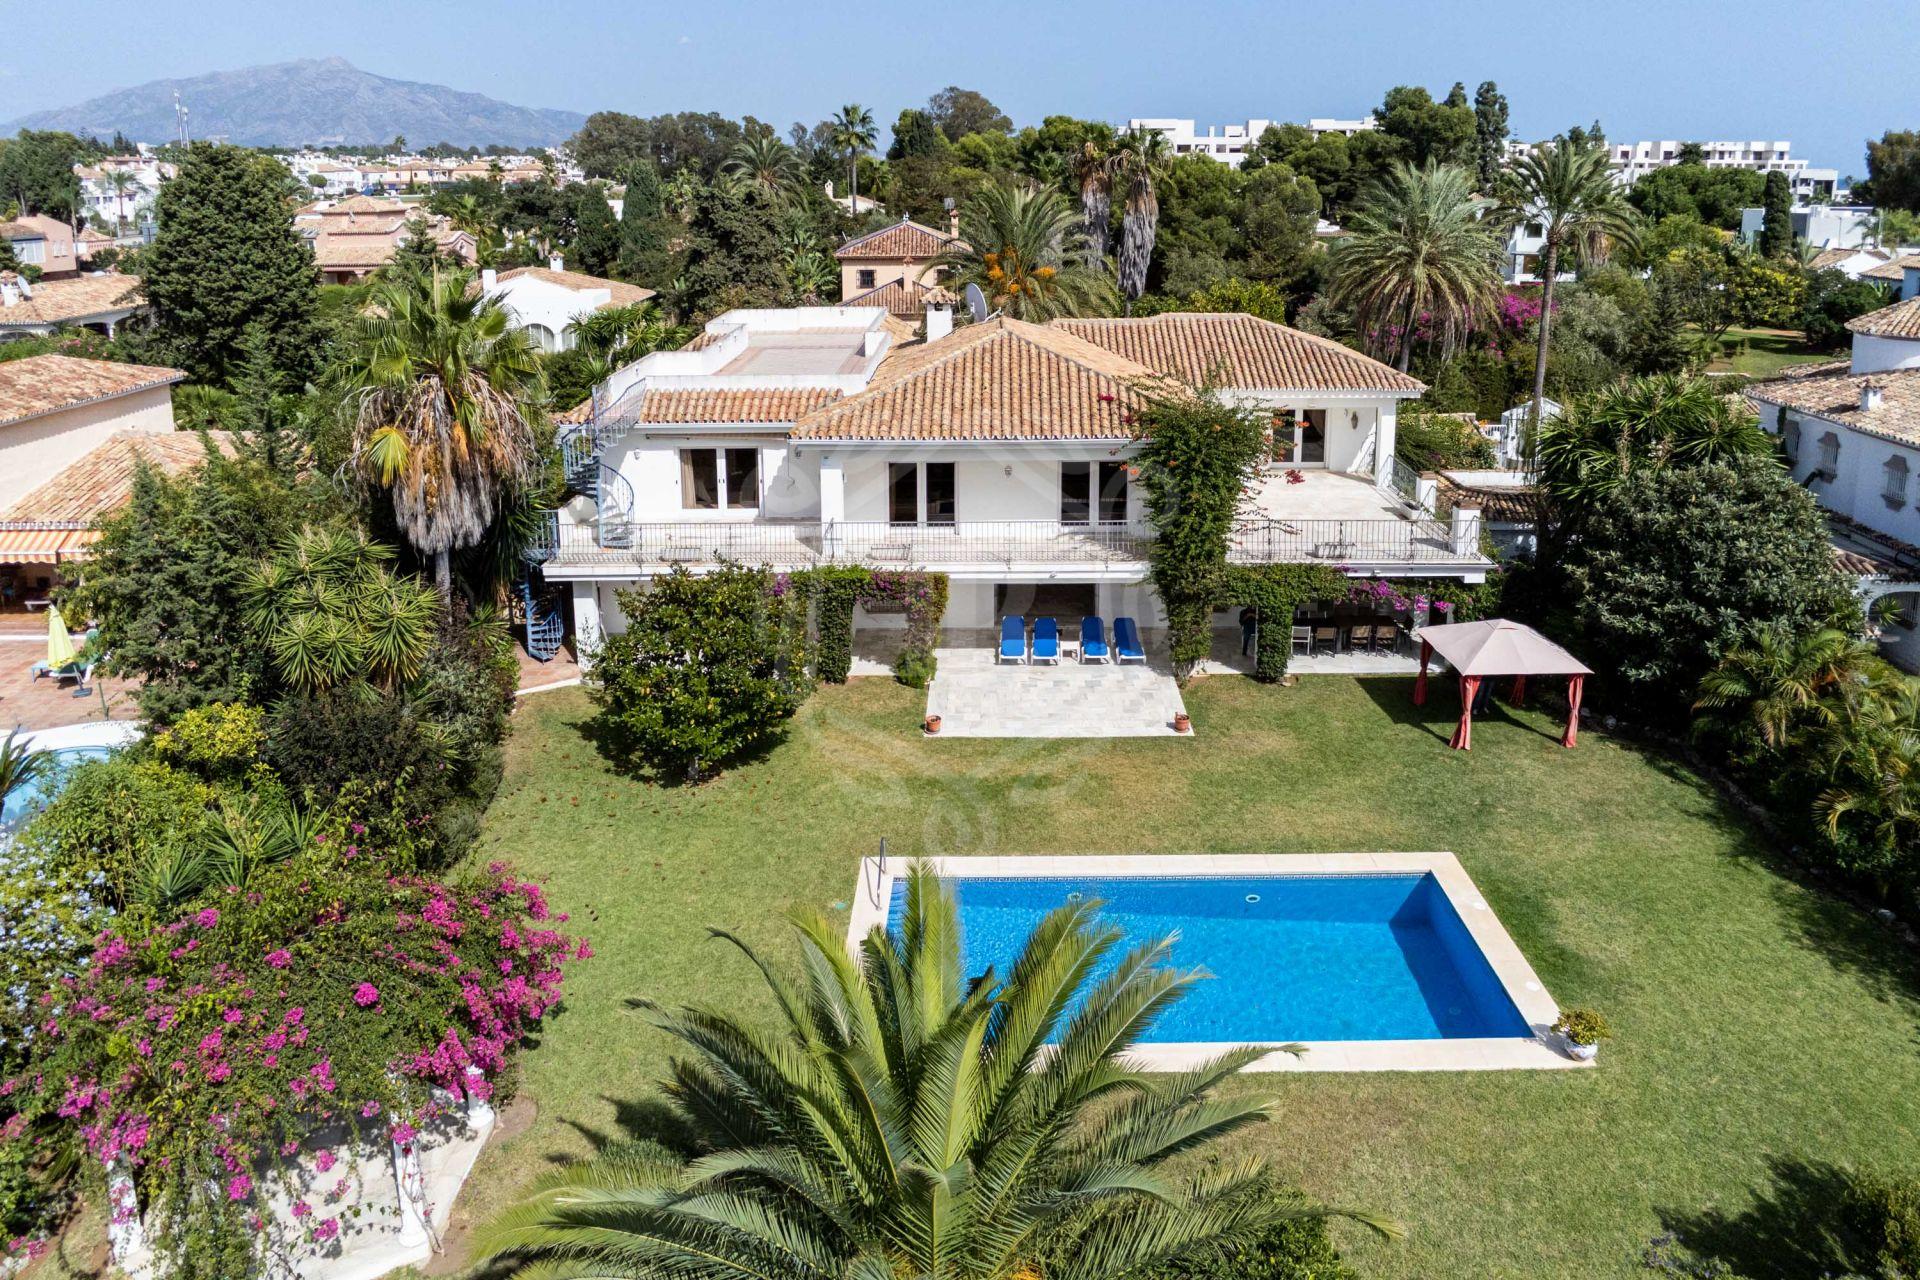 Brilliant villa a few meters from the beach in Paraiso Barronal